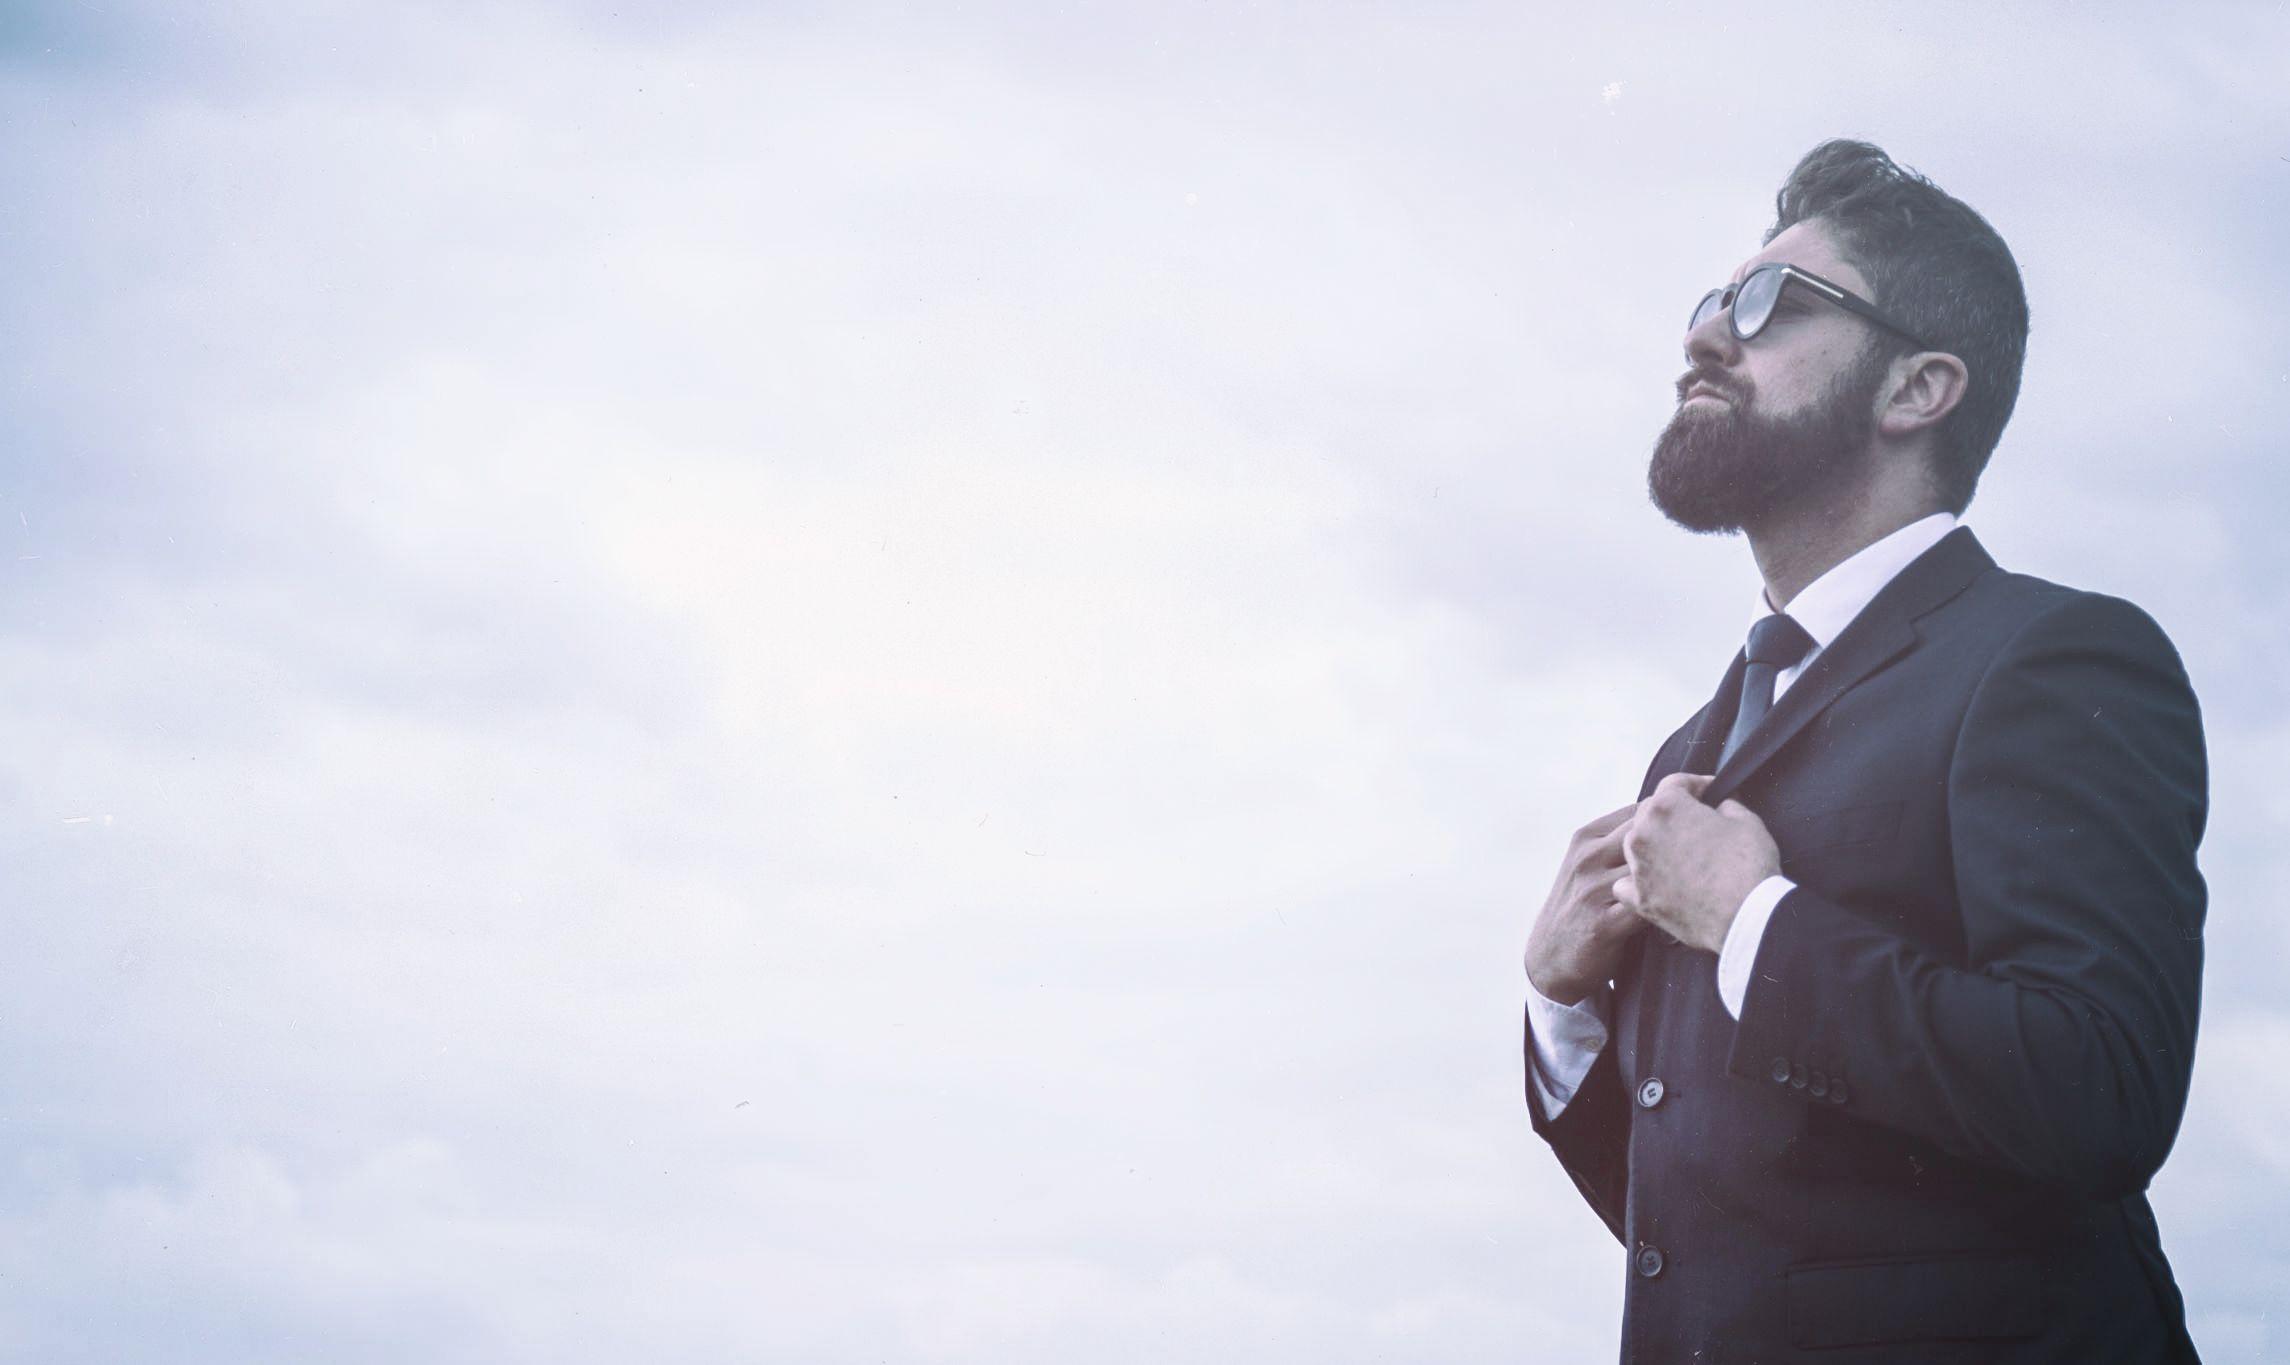 myale-angelo andrea vegliante-intervista